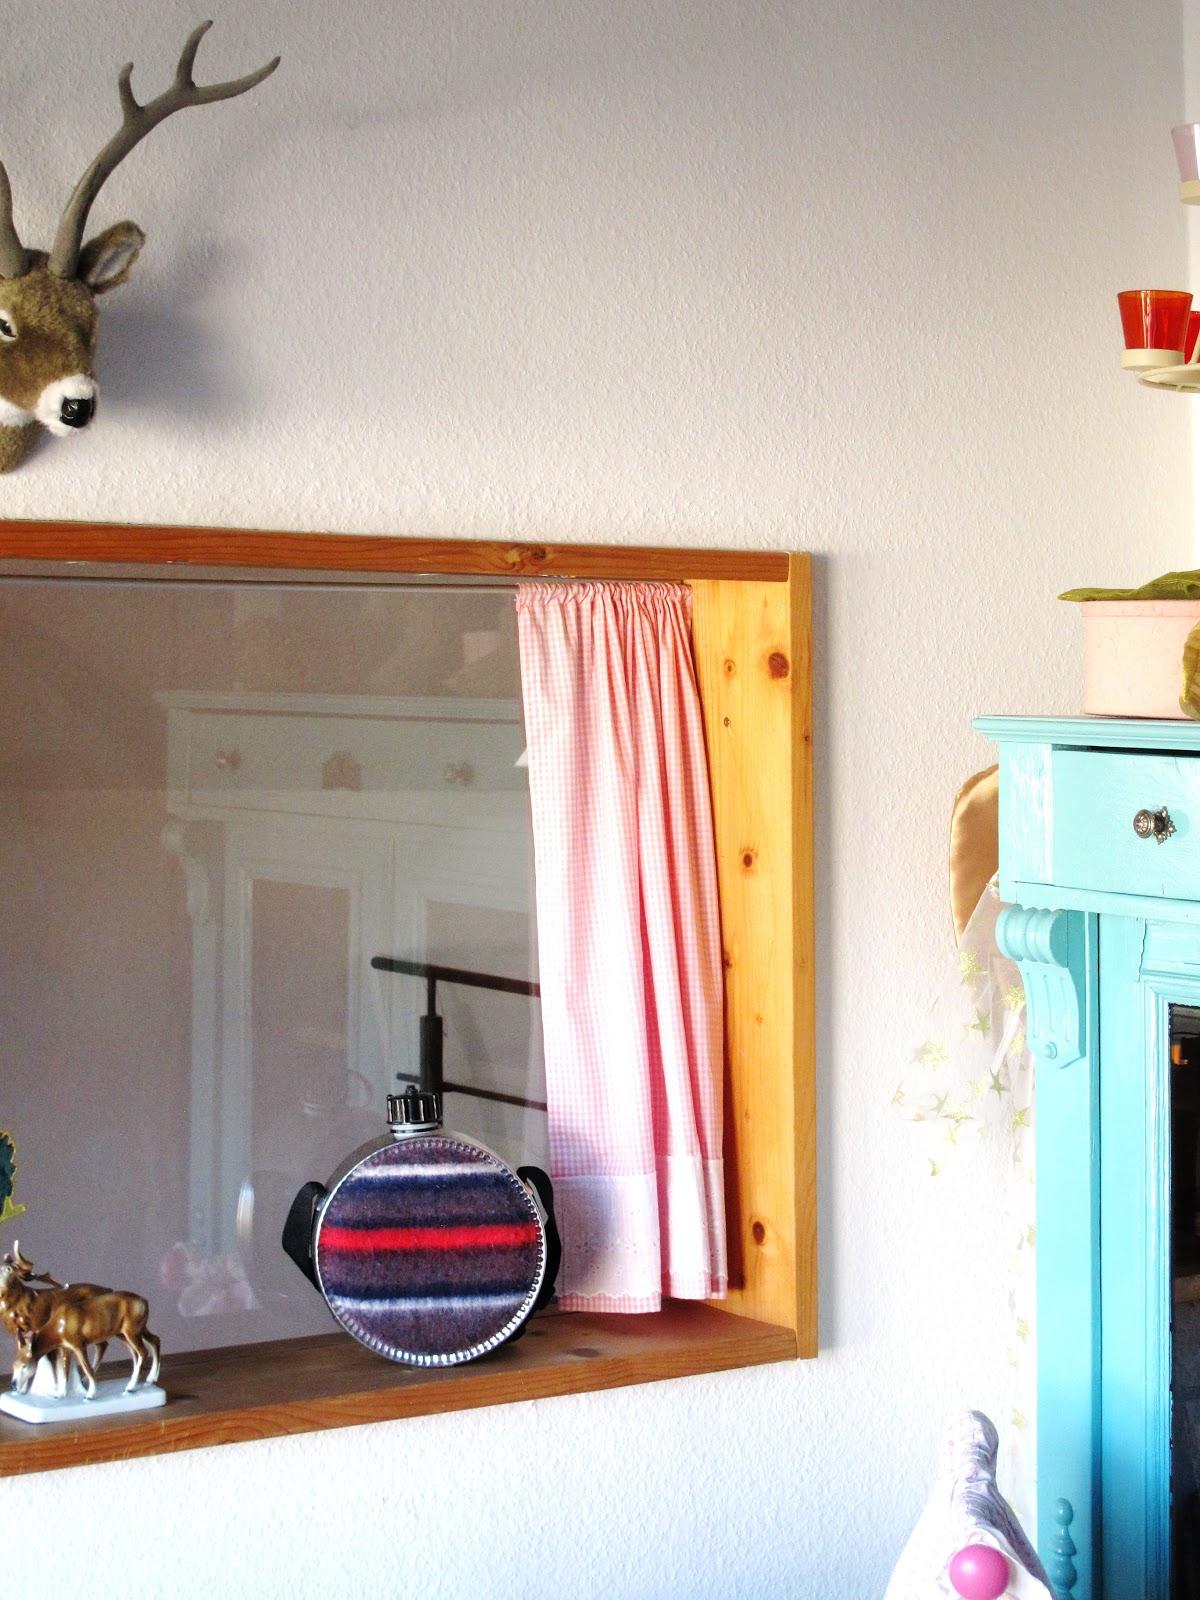 Frida live kinderzimmer impressionen - Kinderzimmer impressionen ...